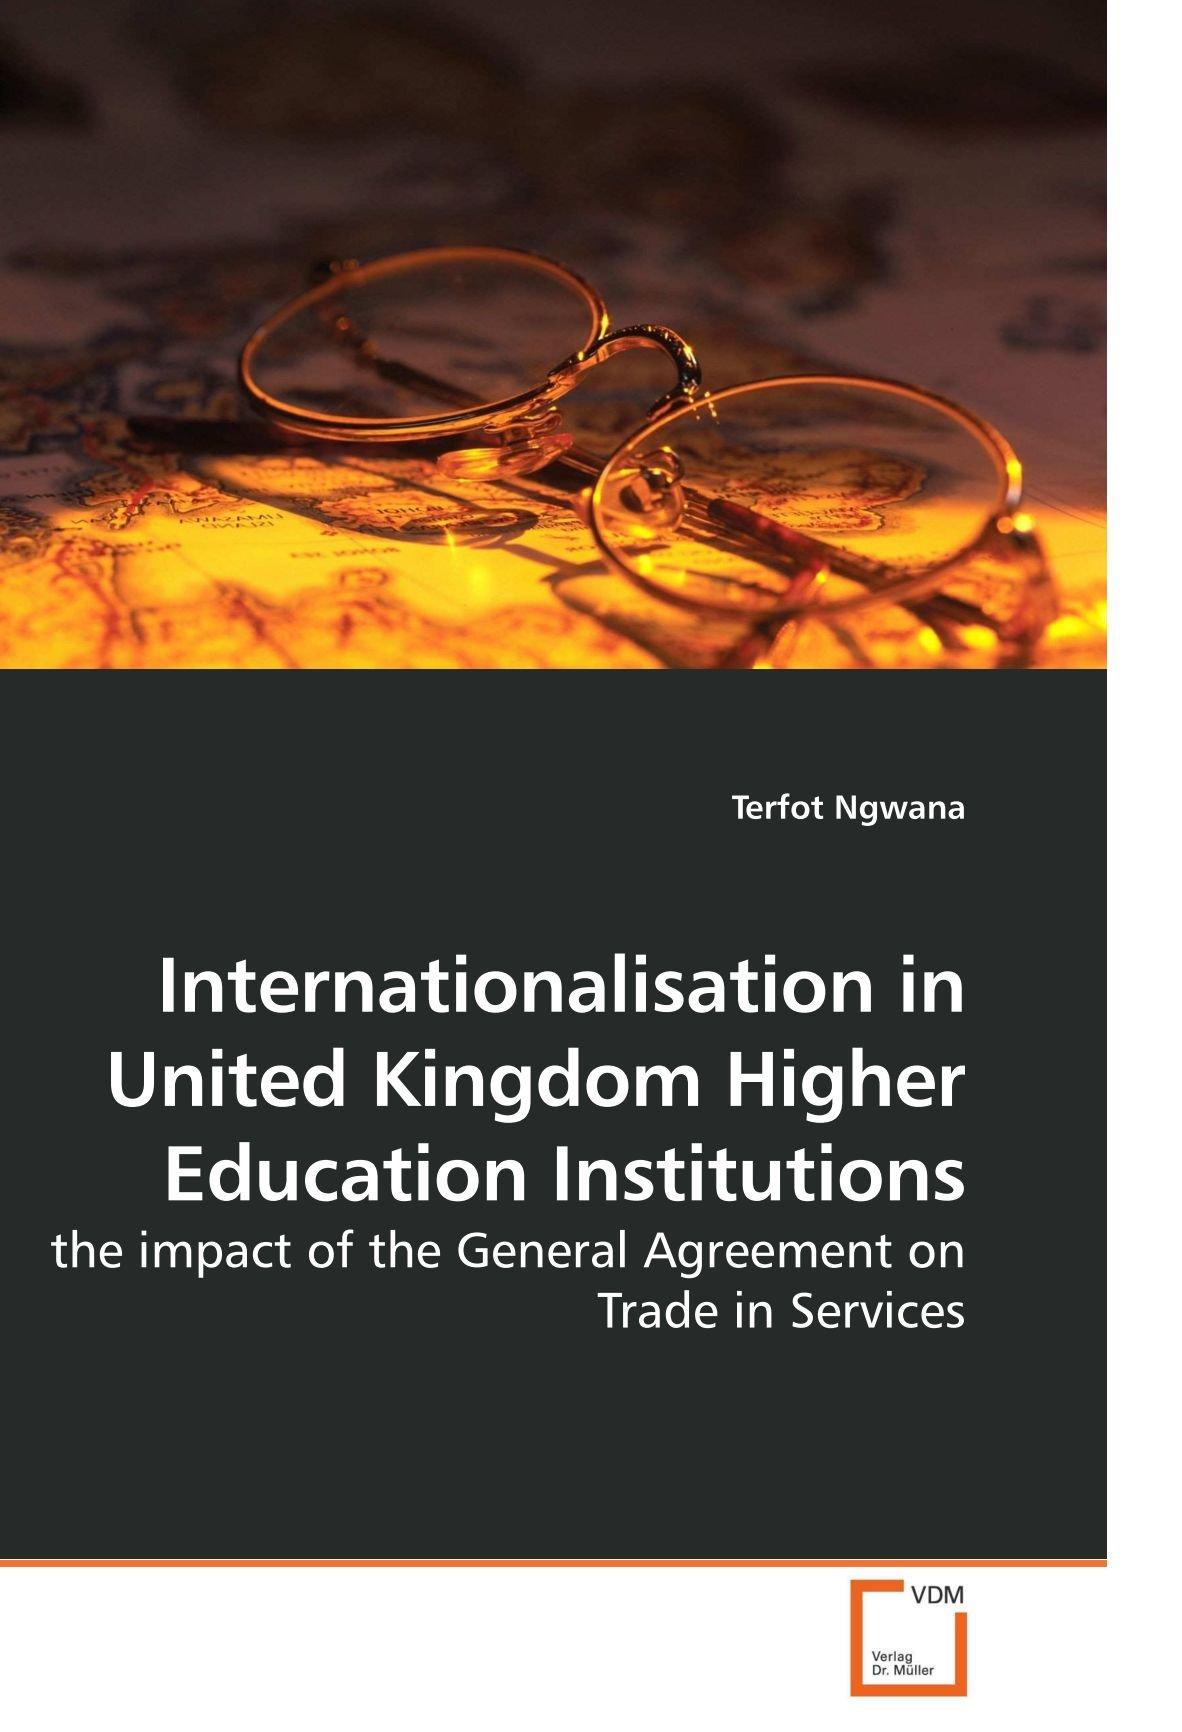 Internationalisation In United Kingdom Higher Education Institutions